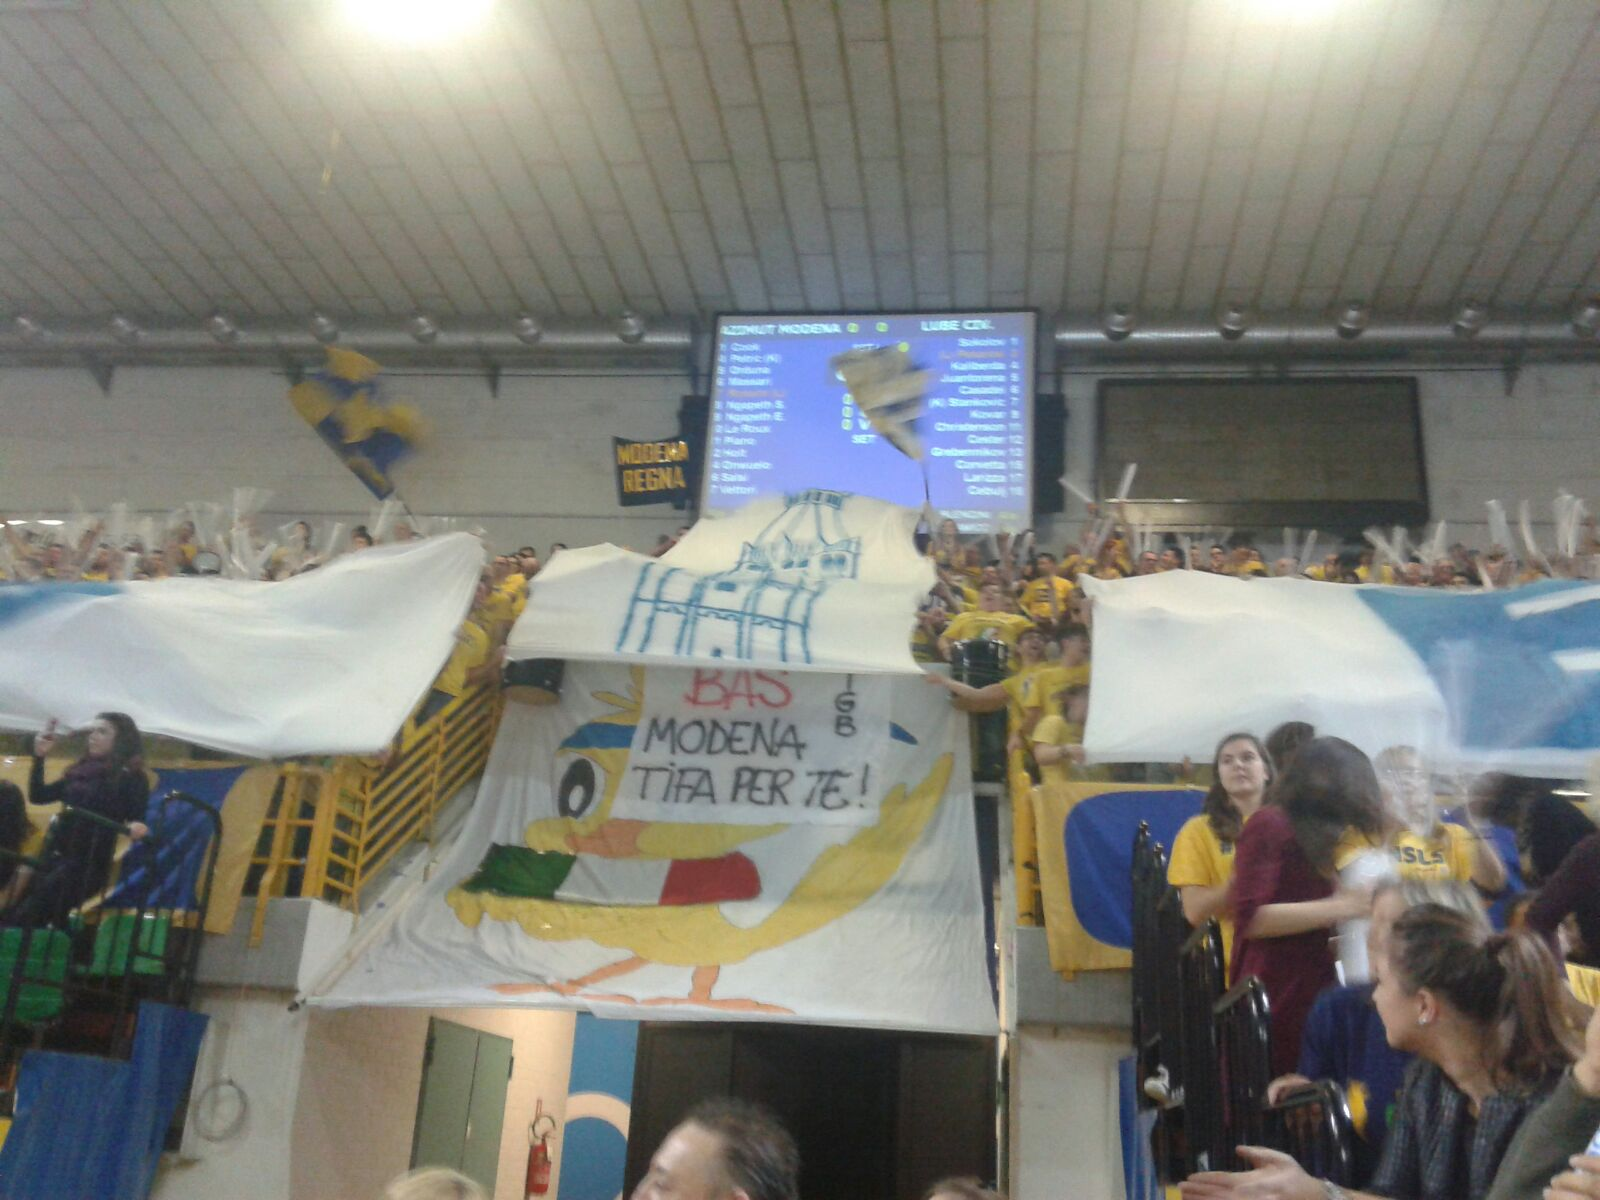 Modena sfiora l'impresa: battuta Civitanova al tie-break